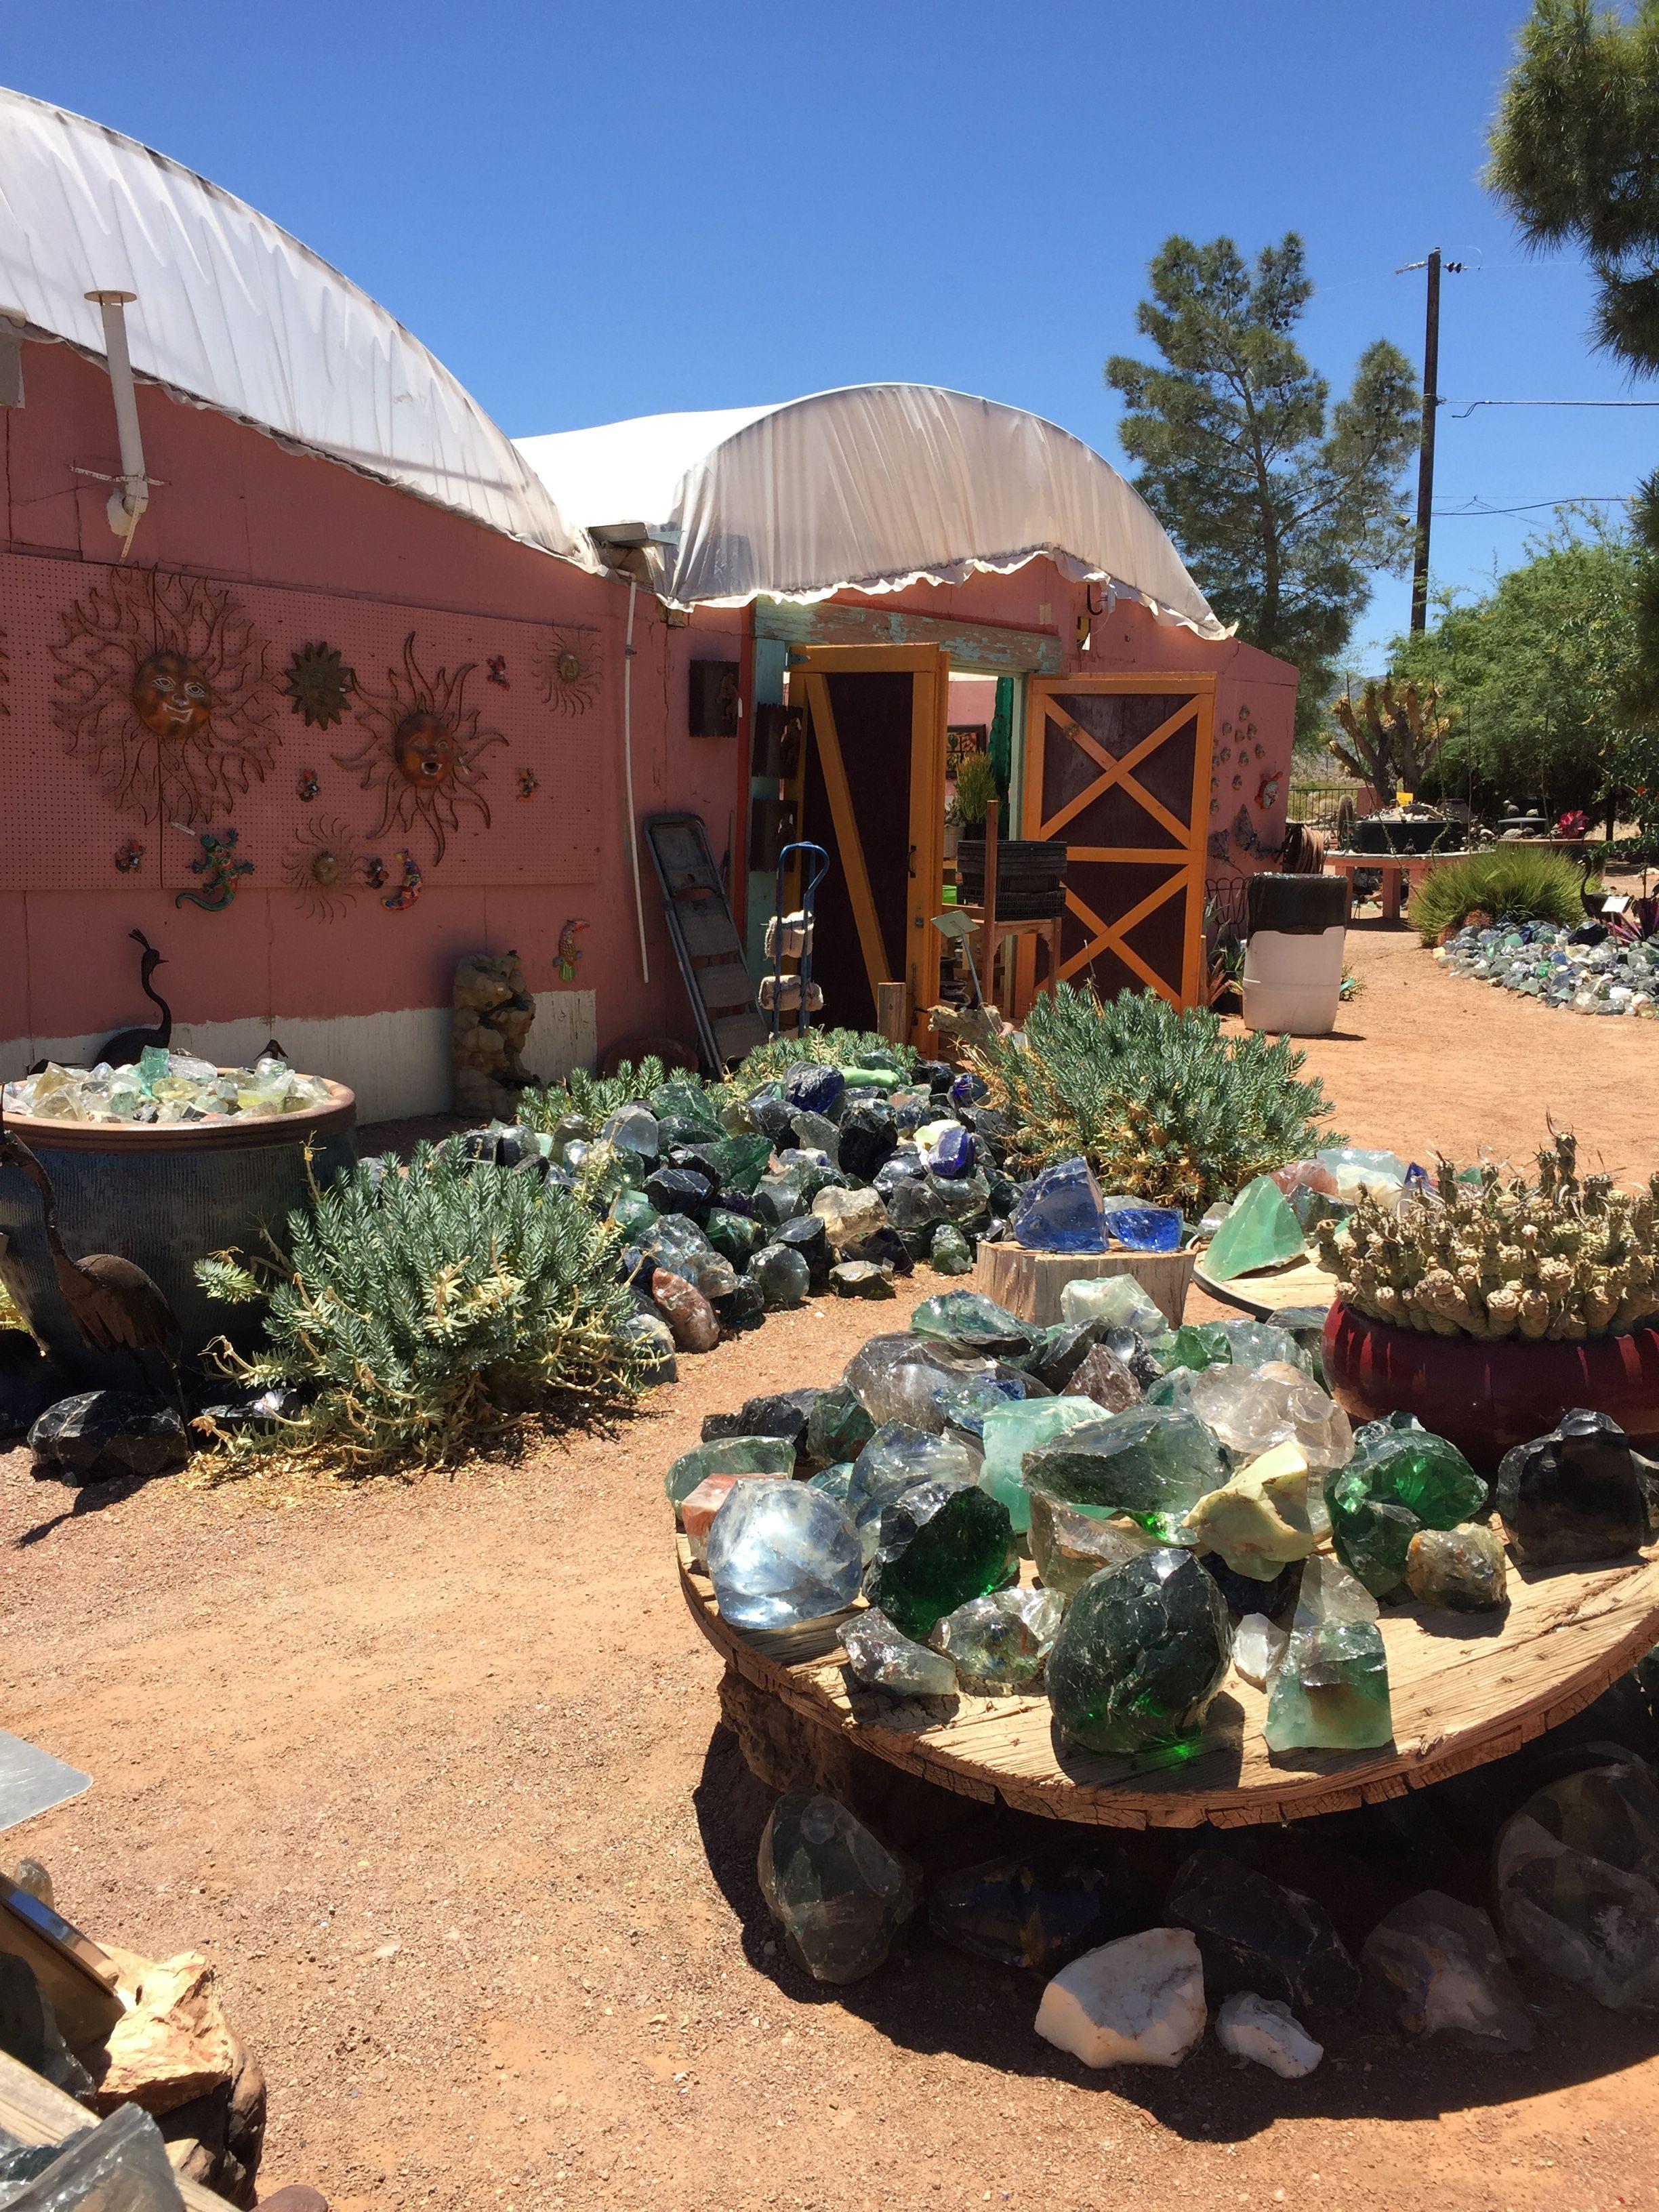 81ade0db0bb5973264819a43a4e6789b - Botanical Cactus Gardens Las Vegas Nv